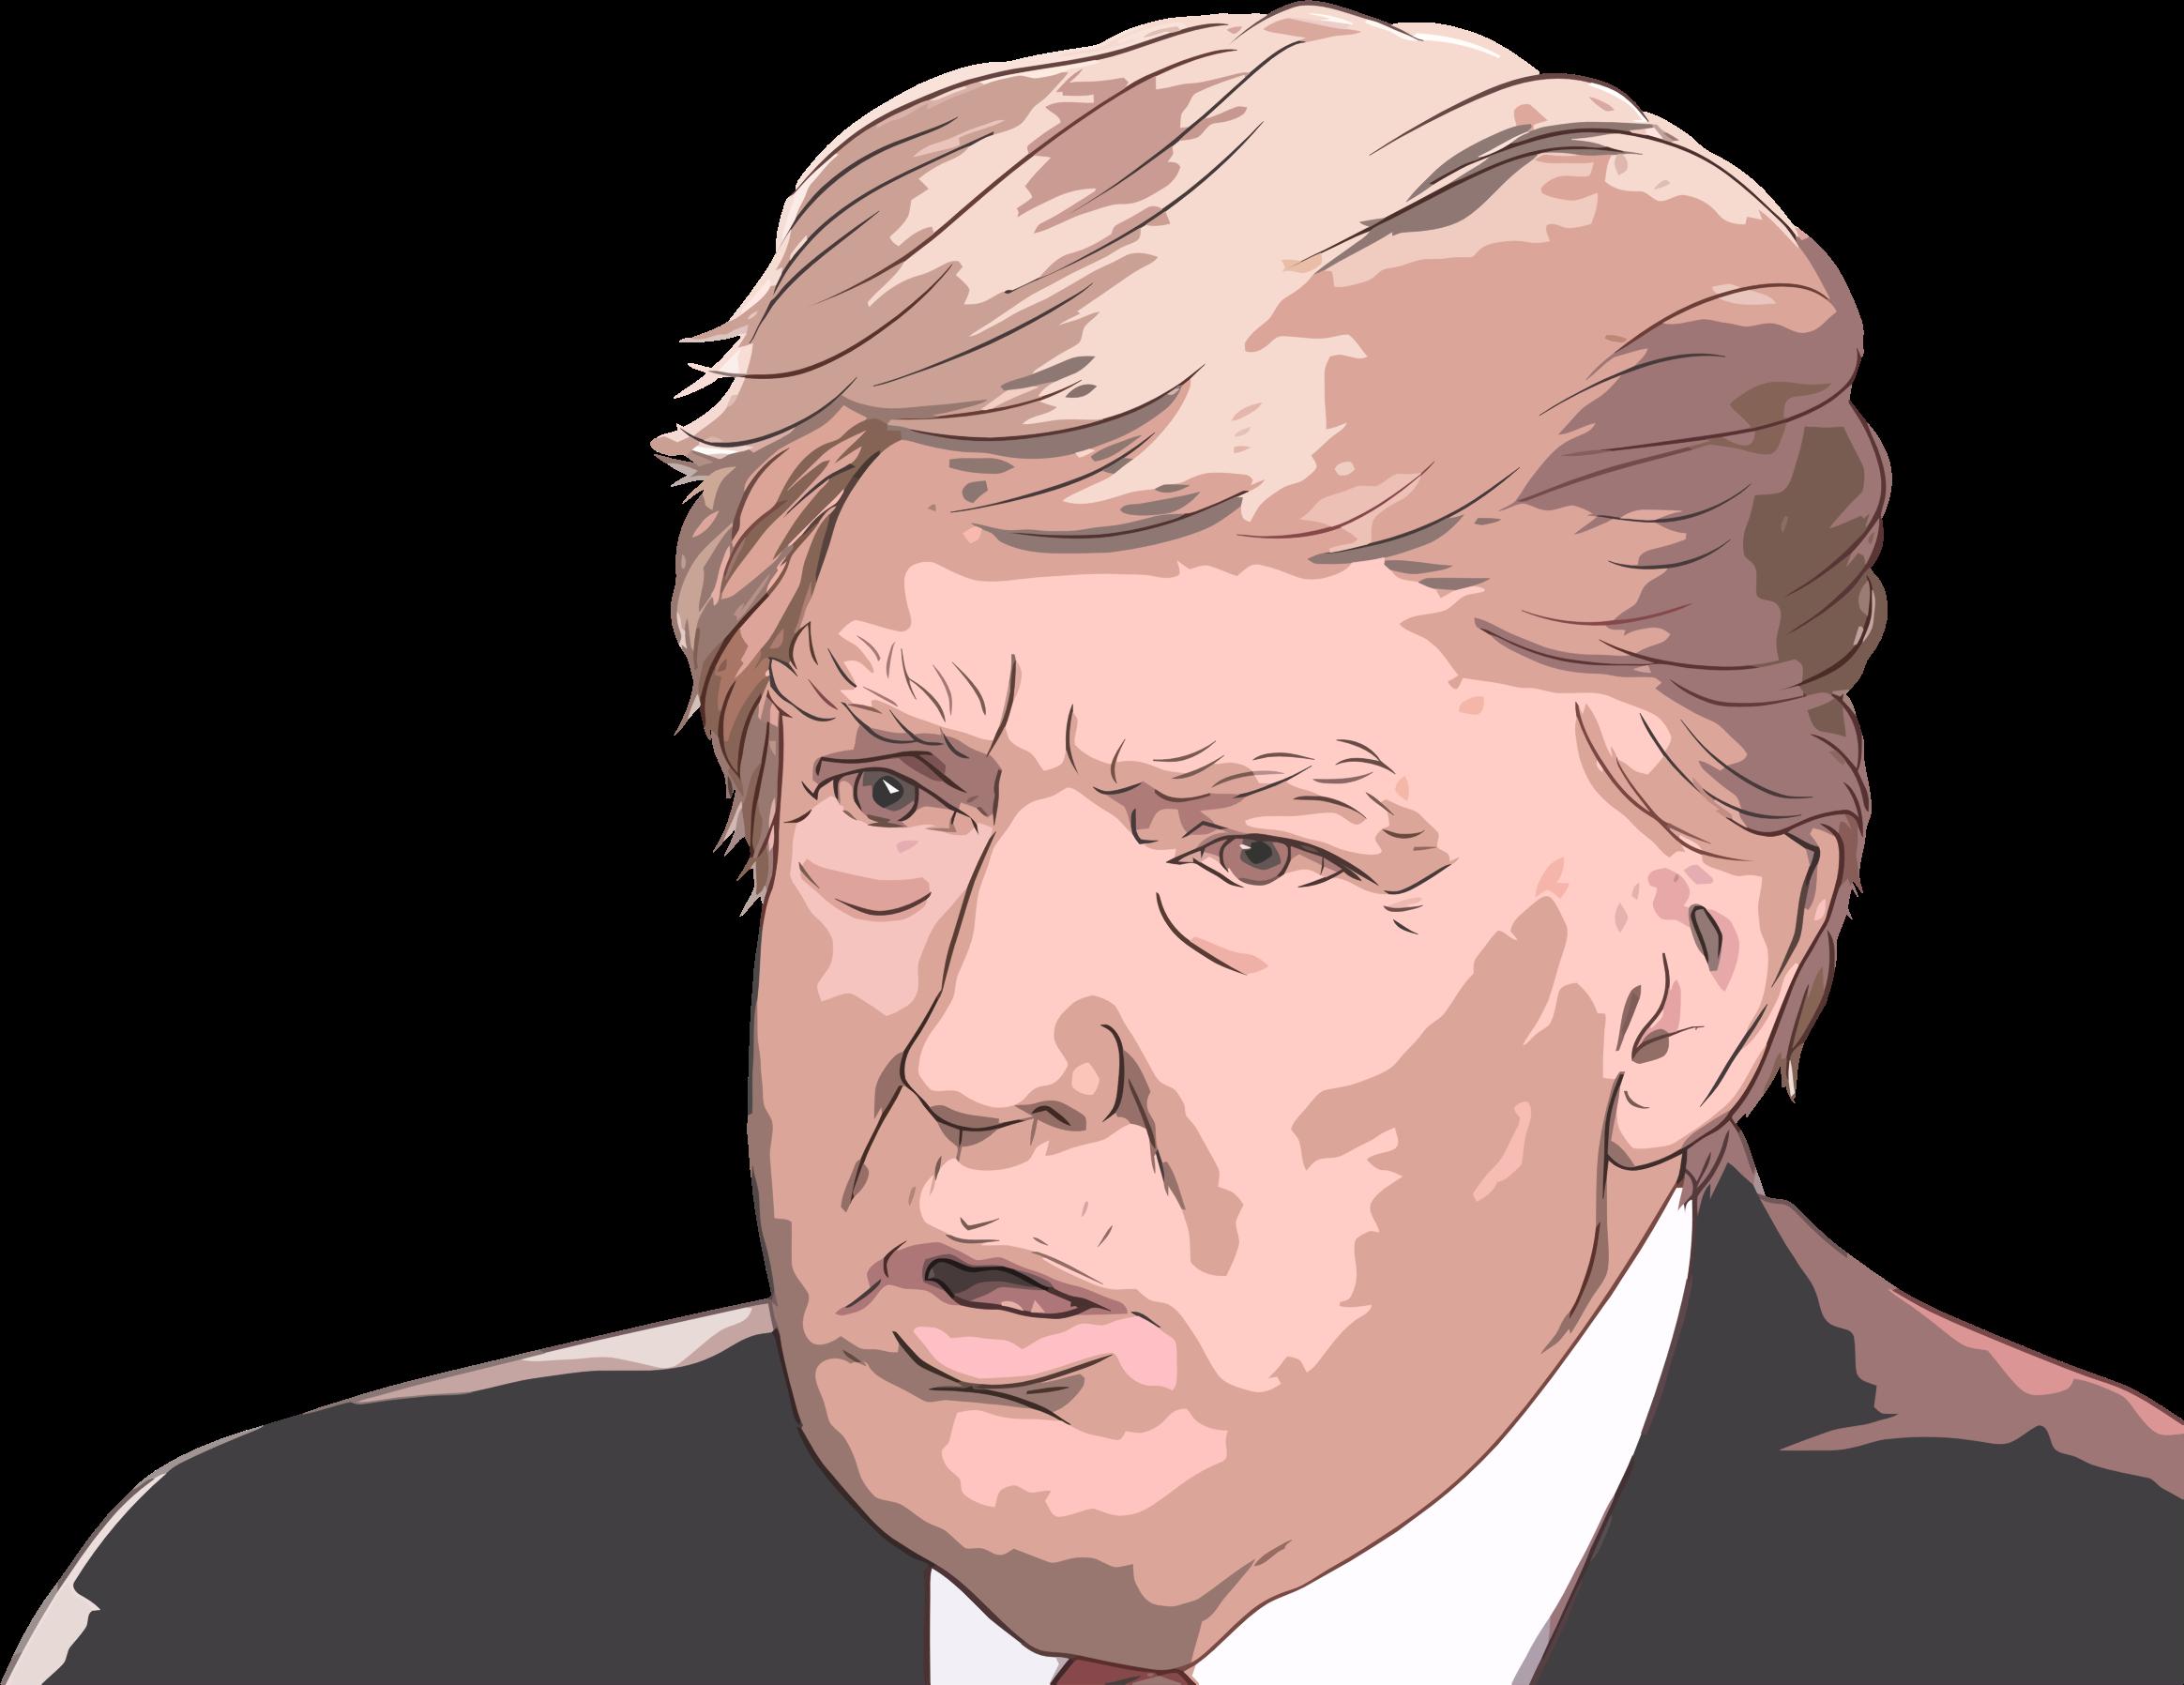 President Clipart Cartoon Donald Trump President Cartoon Donald Trump Transparent Free For Download On Webstockreview 2020